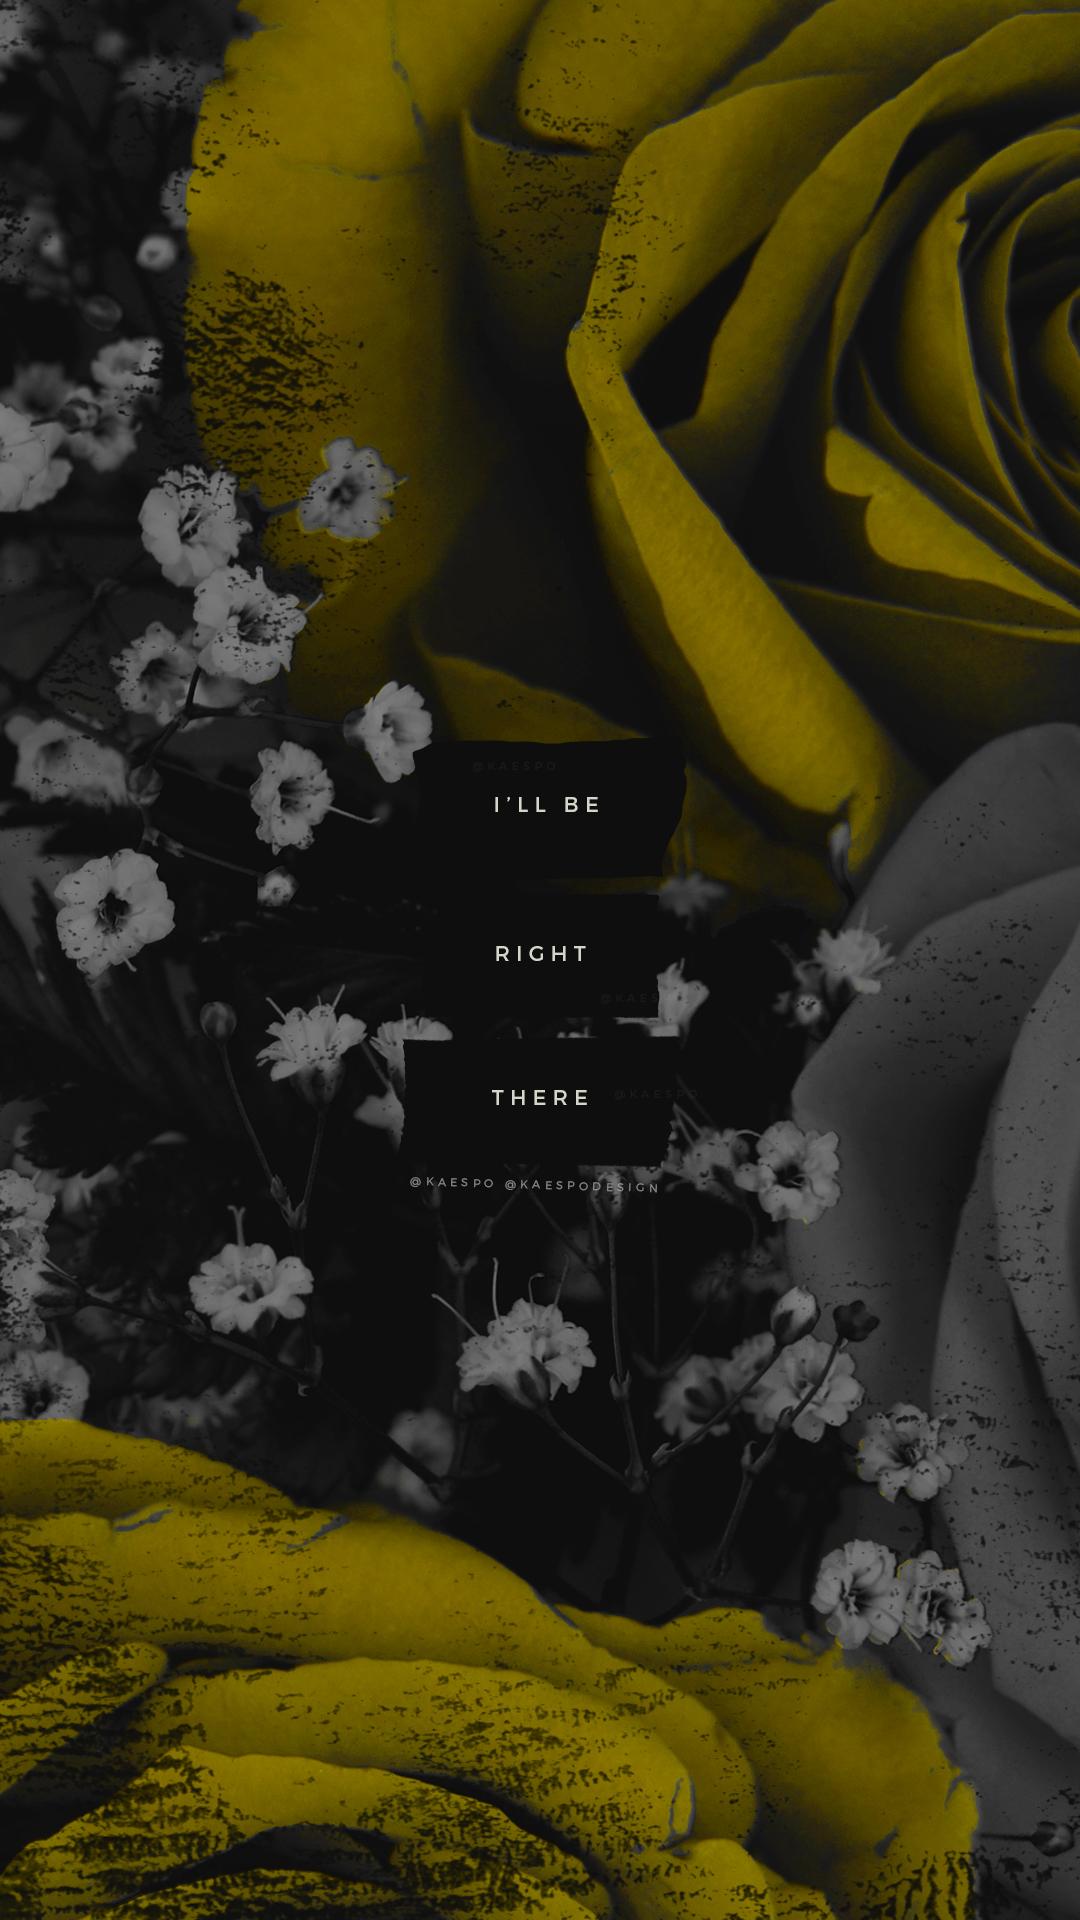 Wallpapers No 428 Jumpsuit Lyrics Dark Florals Yellow Photo